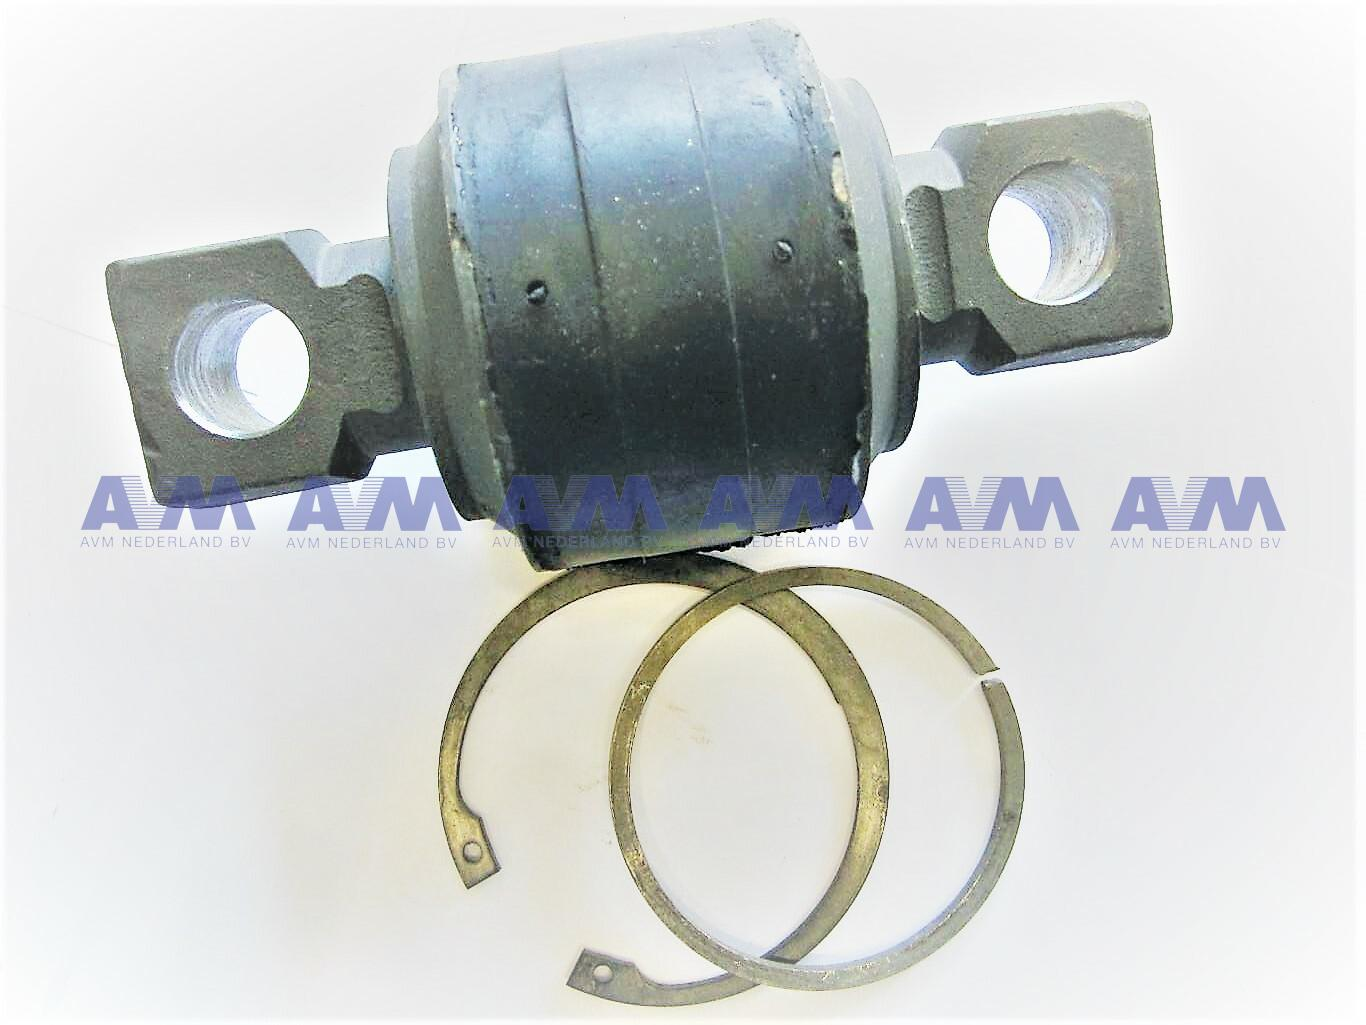 Stangkop 130 reparatieset 2300-90024 Wichmann